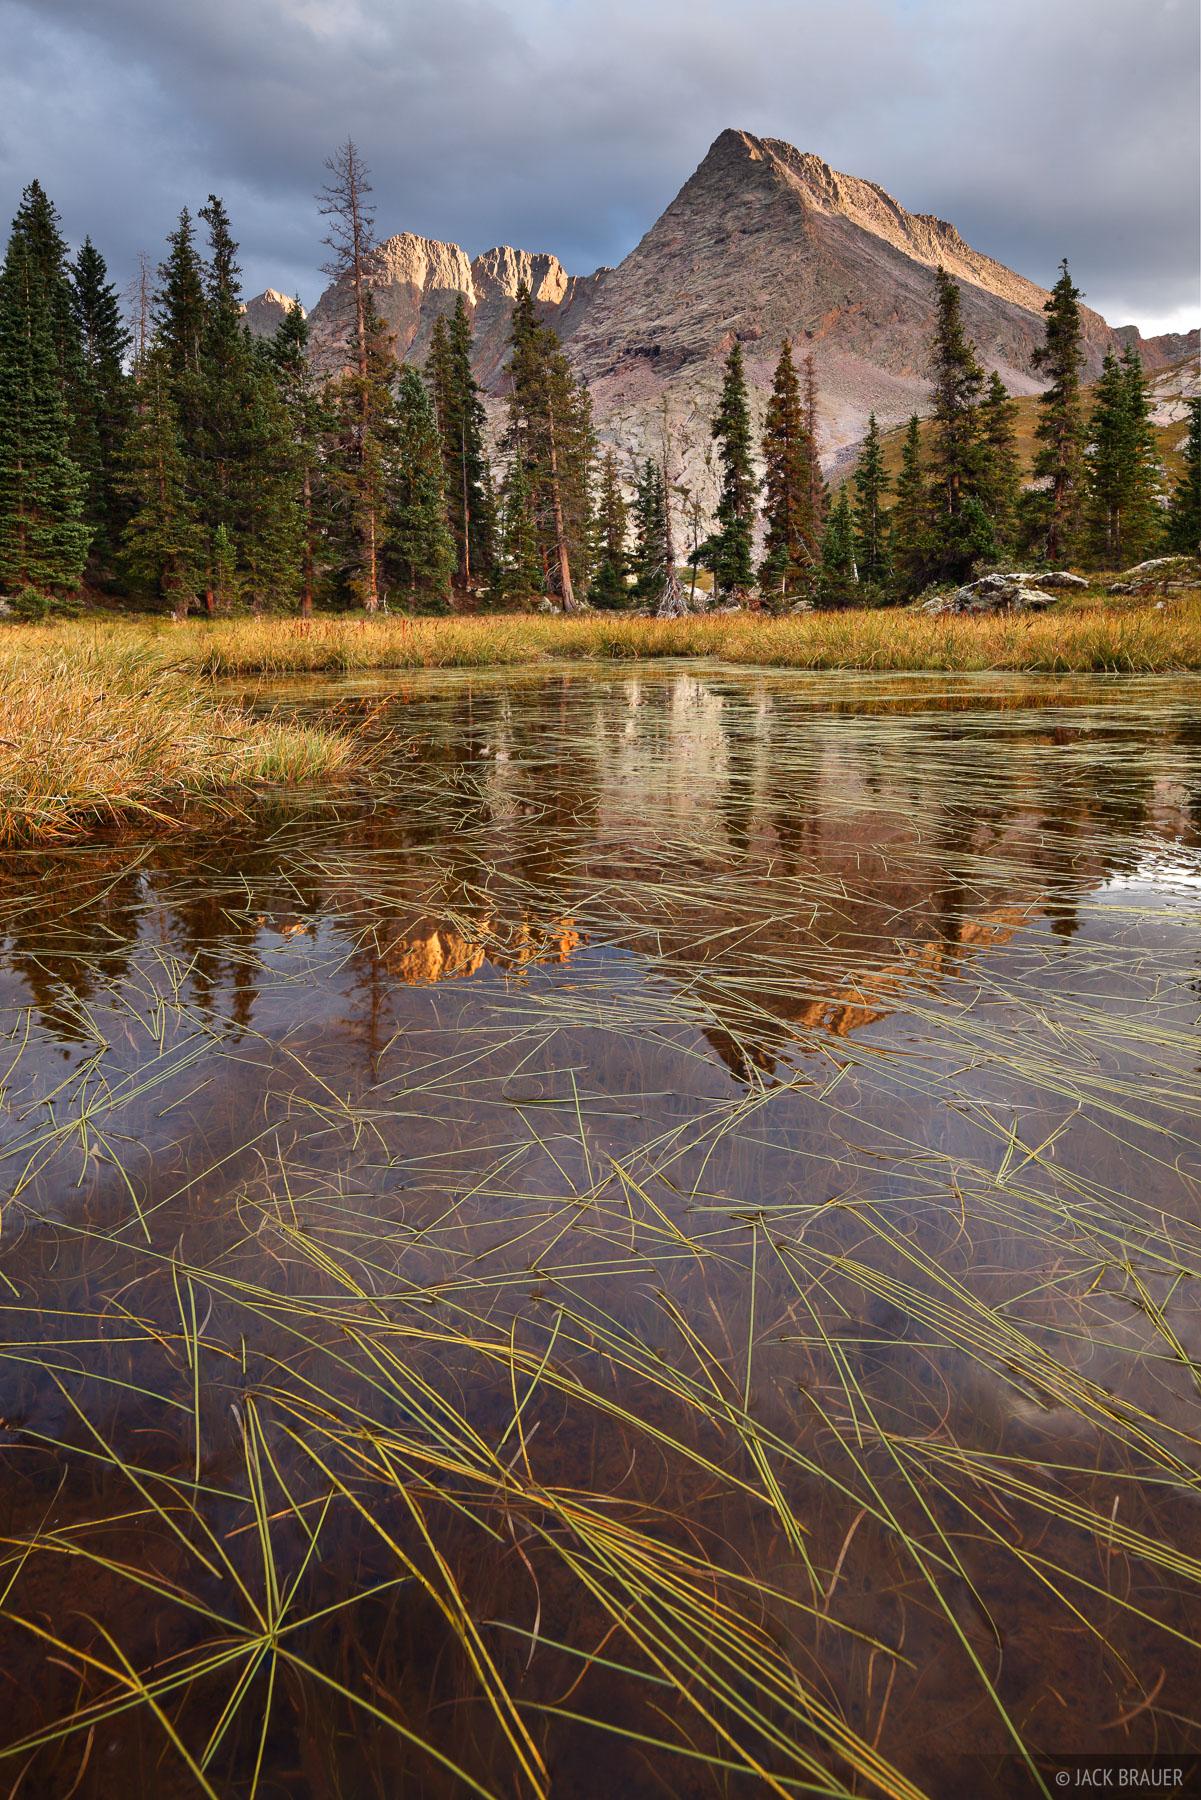 Trinity Peaks, Weminuche Wilderness, San Juan Mountains, Colorado, photo